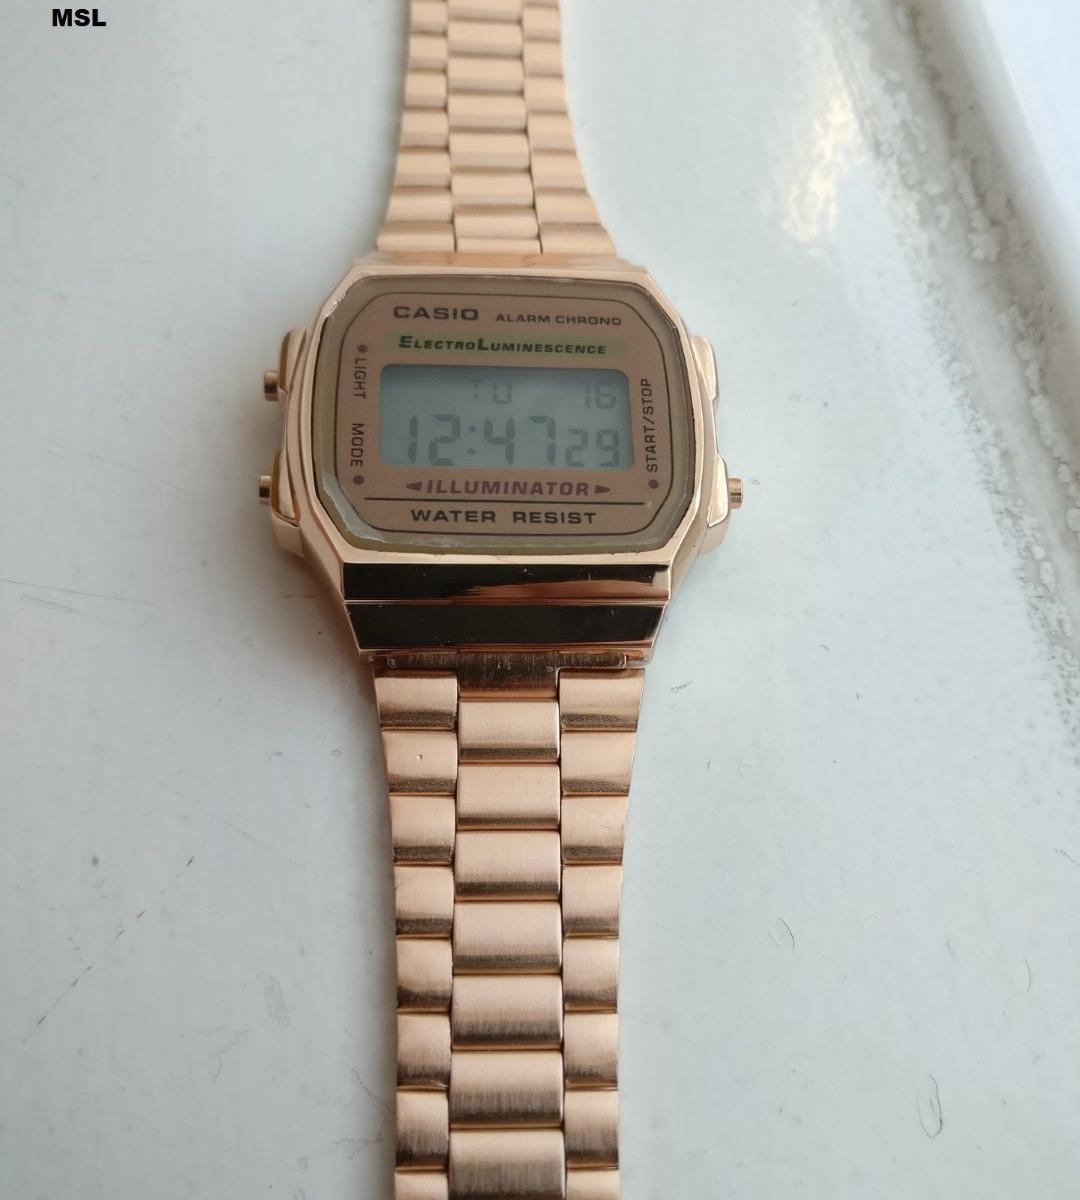 cb1047bfdc8 Relógio Casio Clássico Retrô Unissex Digital Ouro Rosé + Cx - R  129 ...